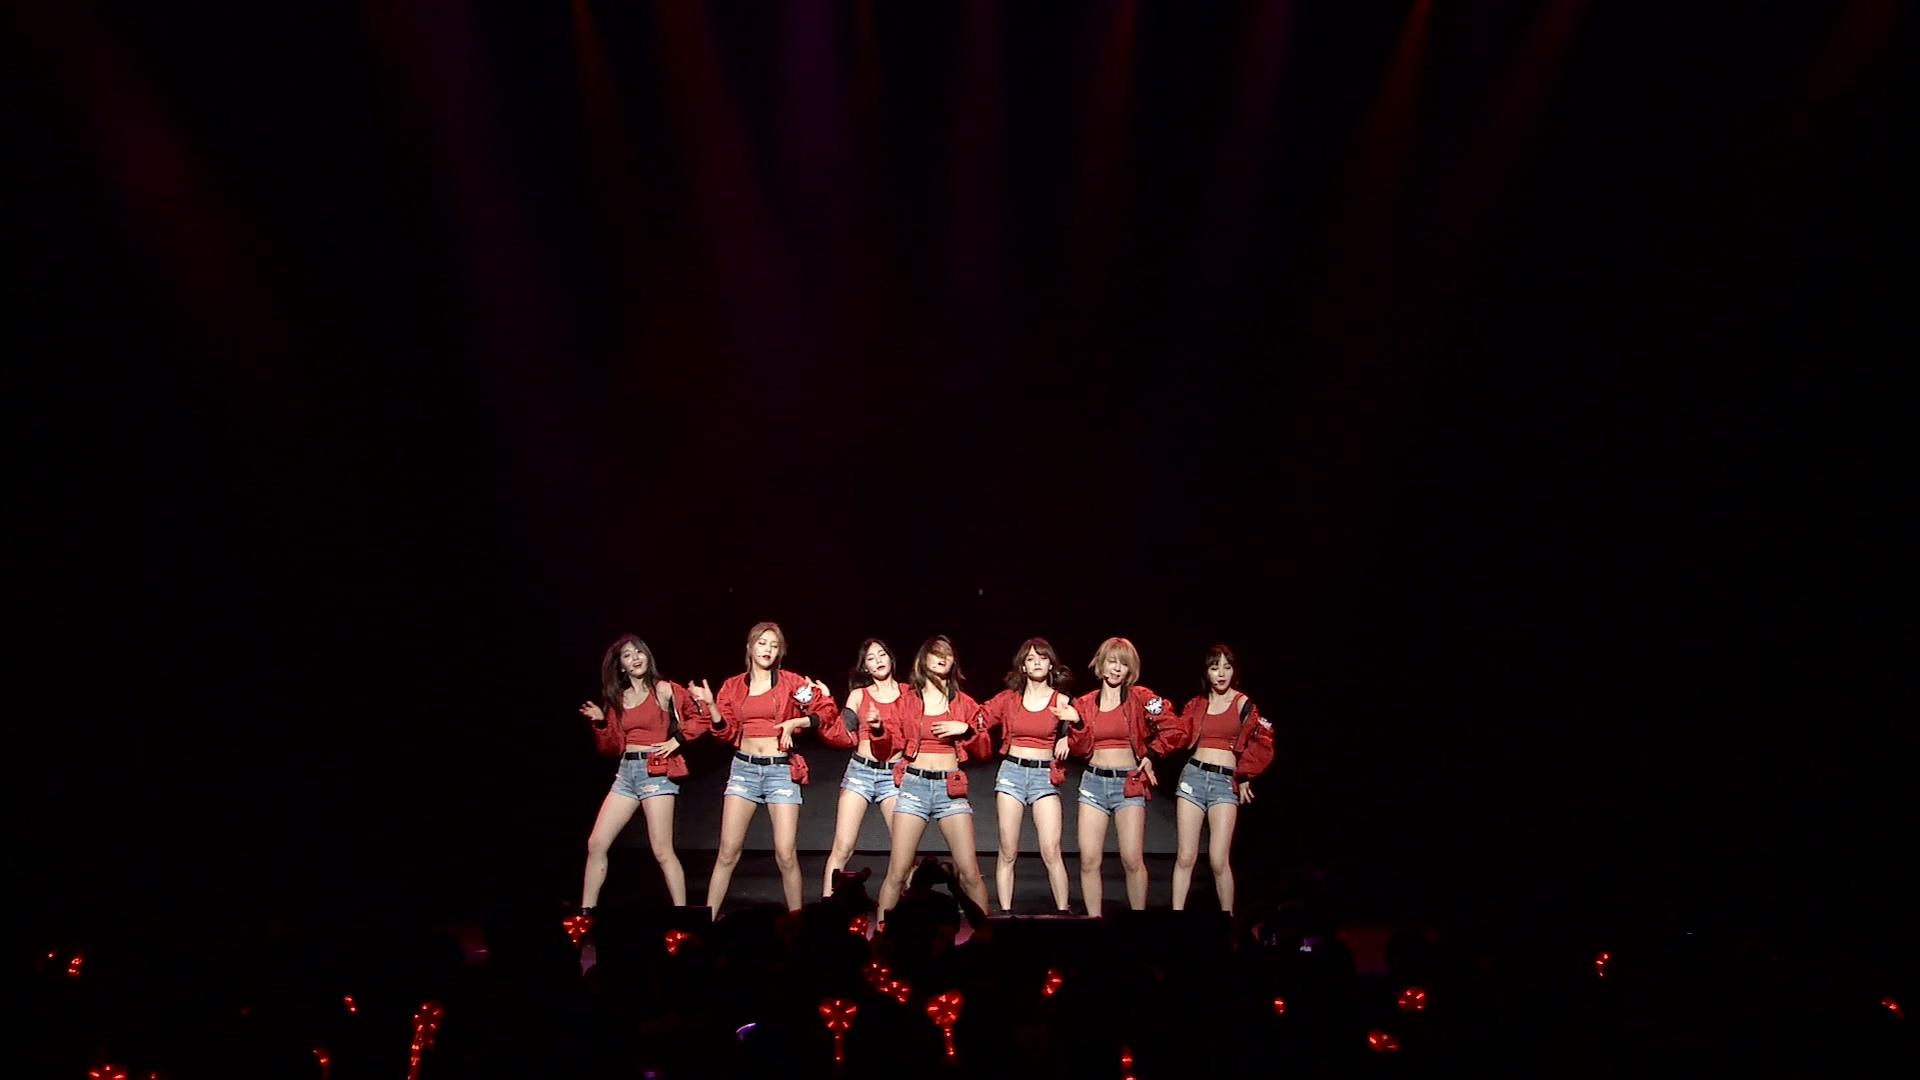 AOA-Summer_Concert_in_Japan_ANGELS_WORLD_2016.mkv_20200915_183027.823